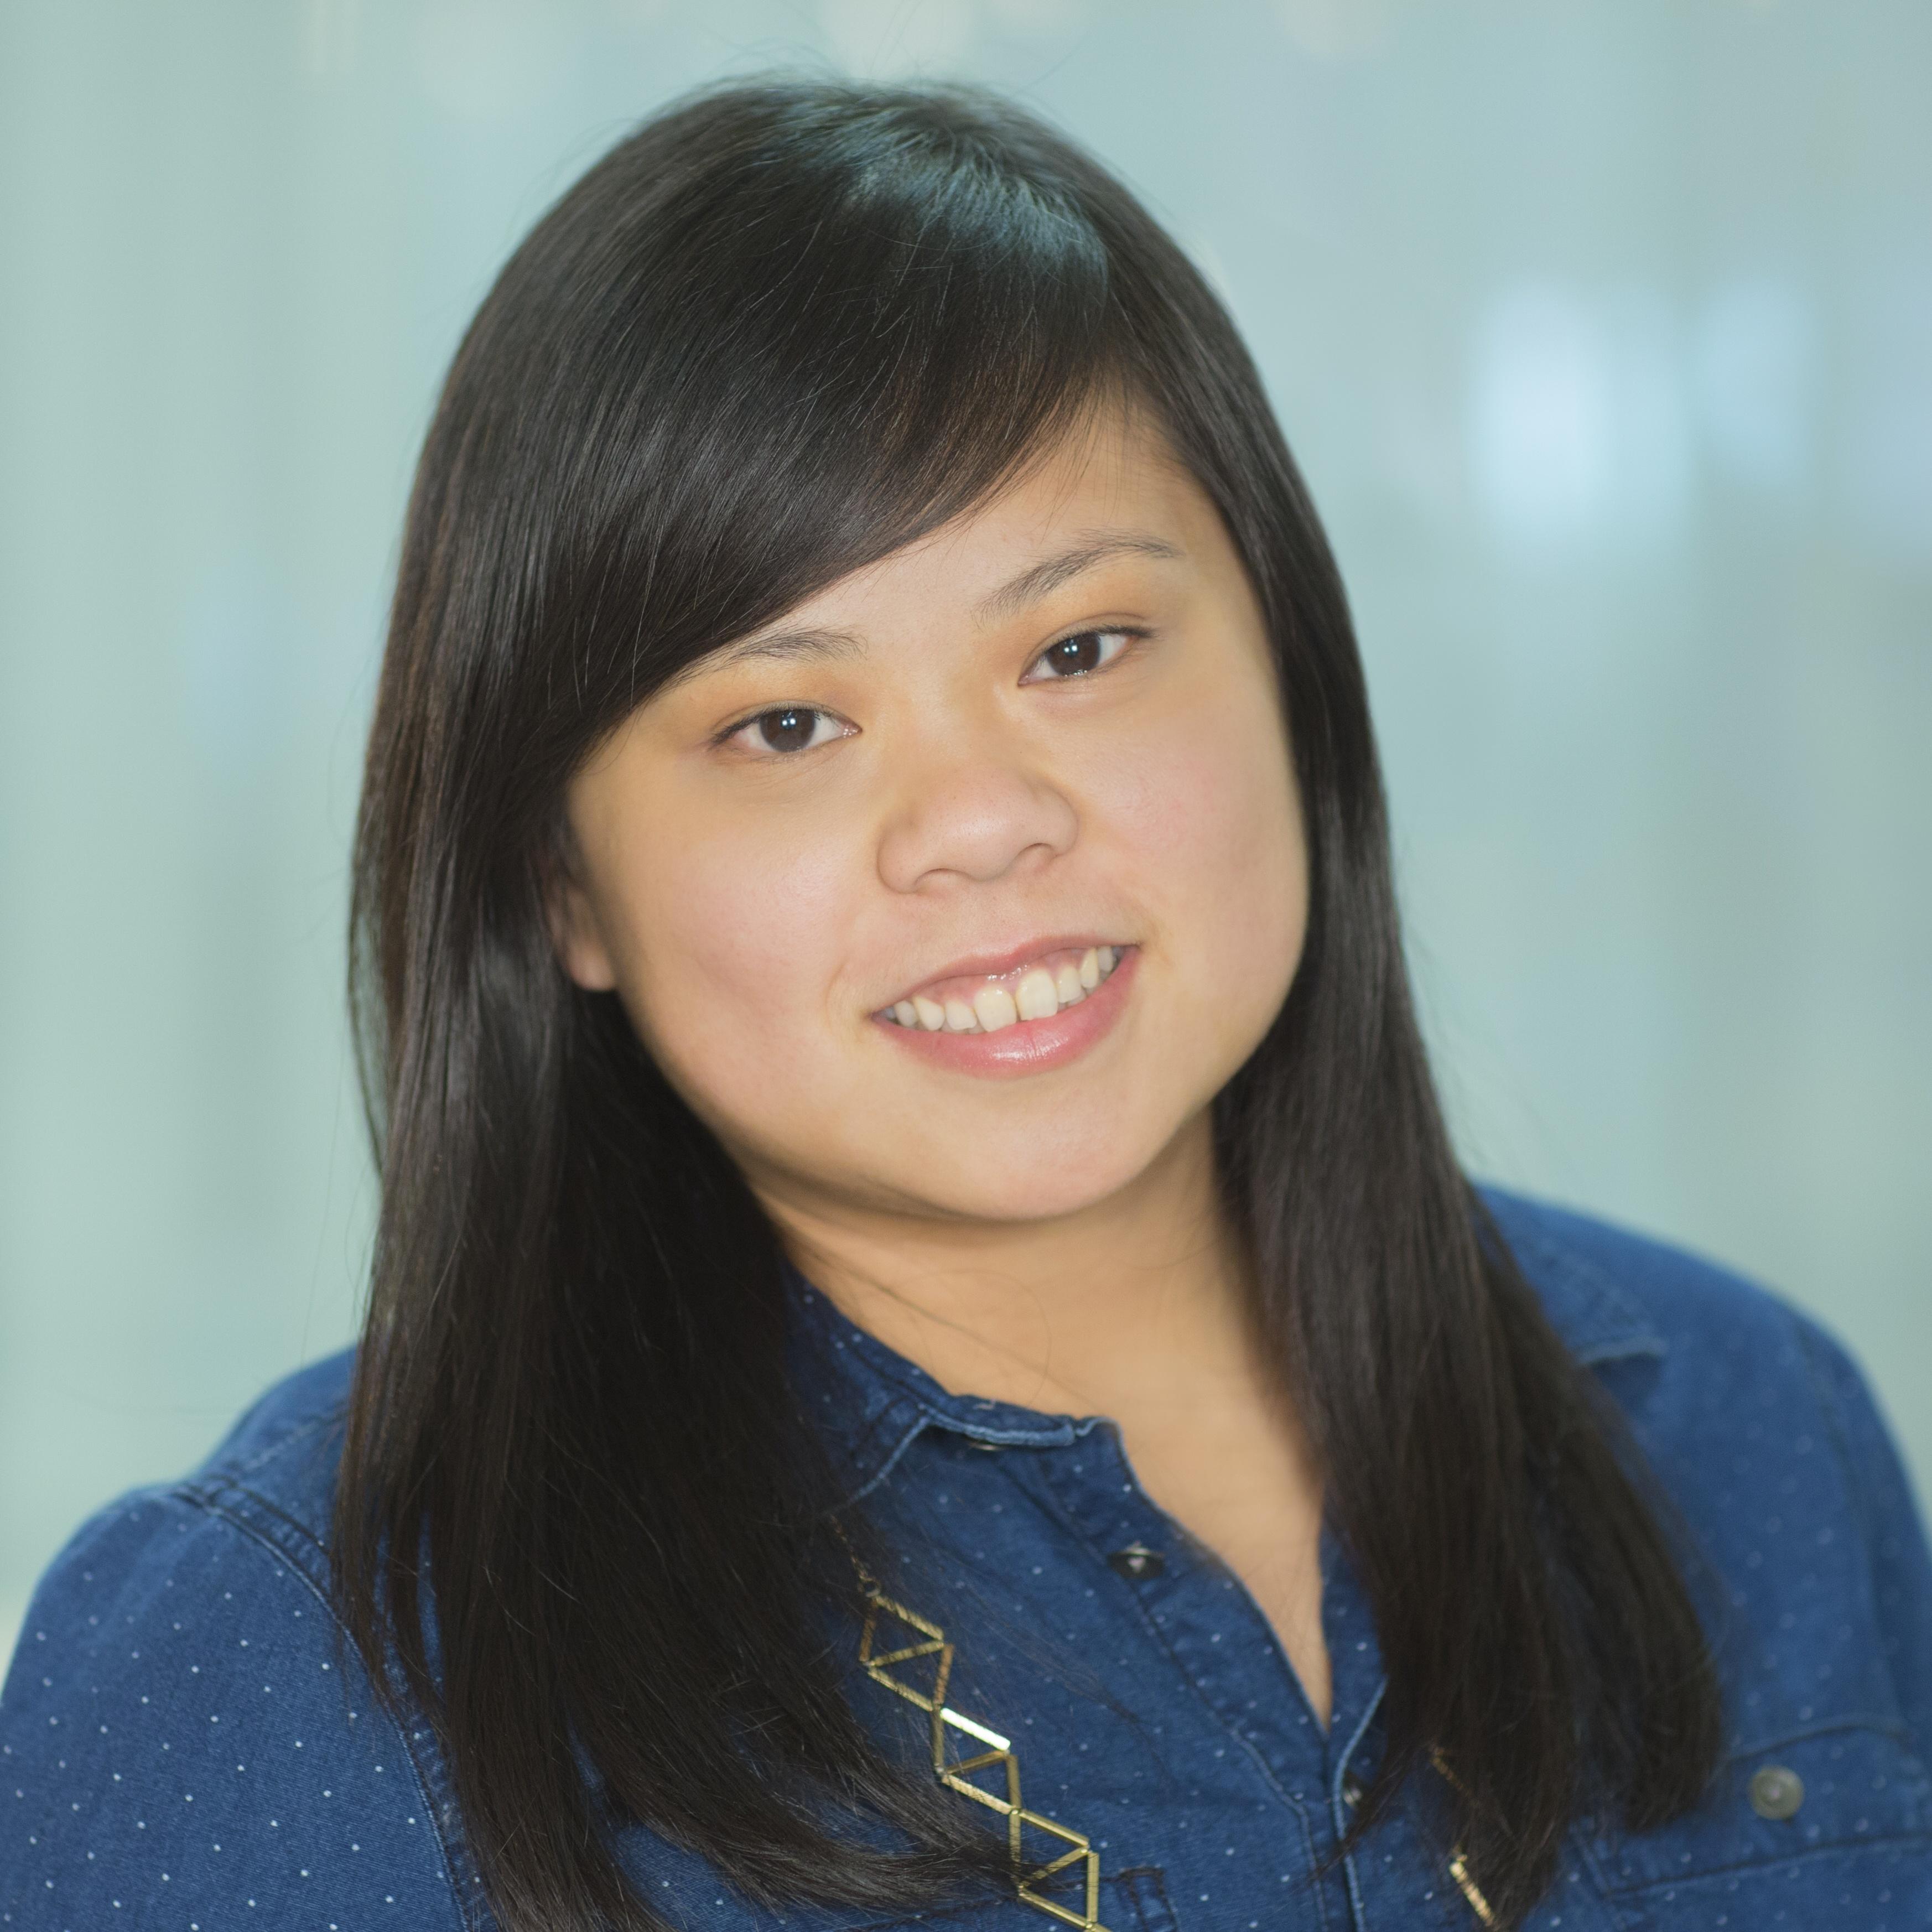 Christine_Huynh-1.jpg